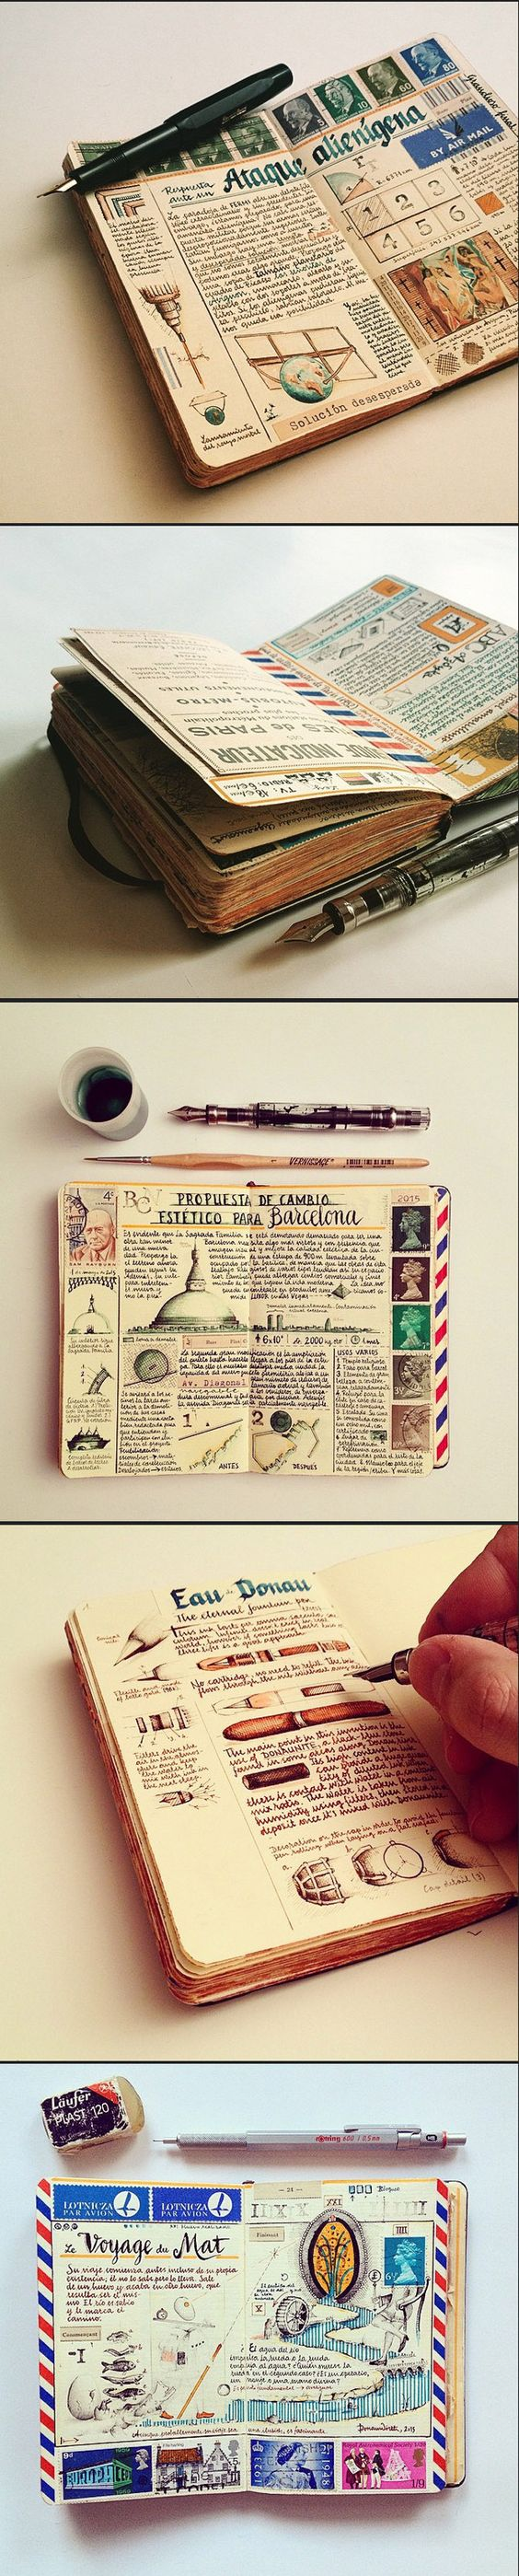 José Naranja #journal #sketch | https://www.flickr.com/photos/36284439@N00/: